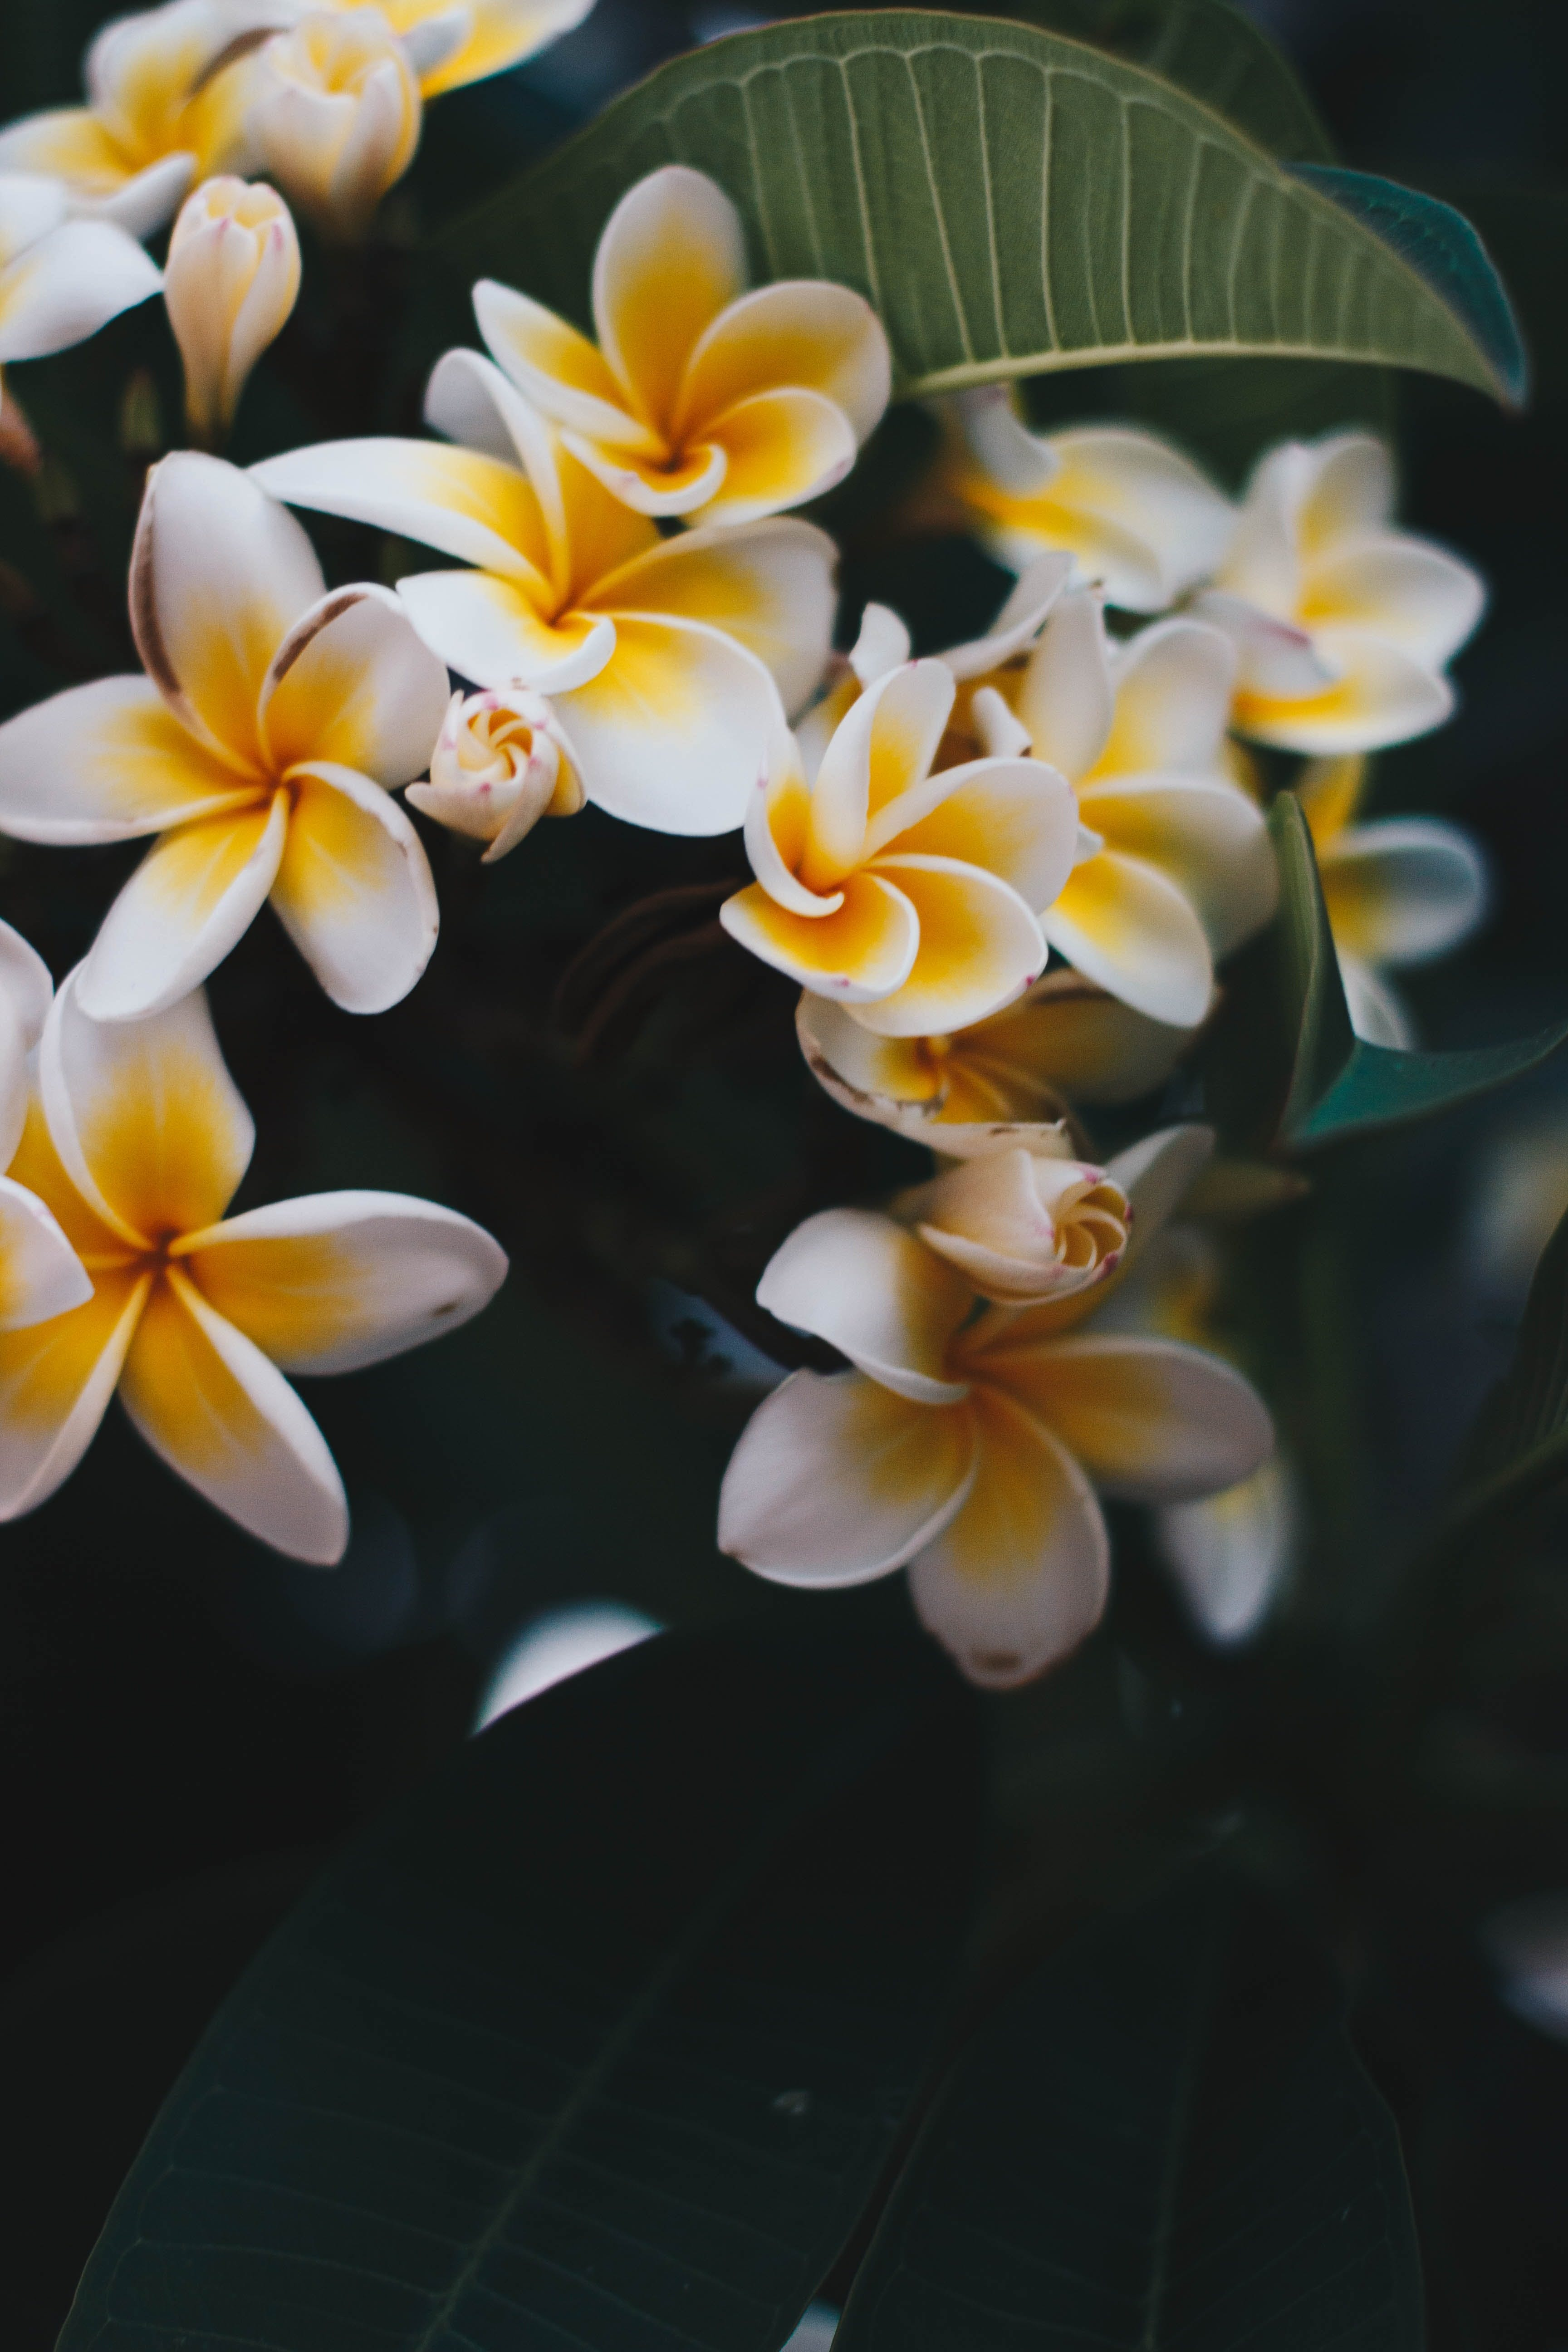 Photo of Yellow-and-white Frangipani Flowers